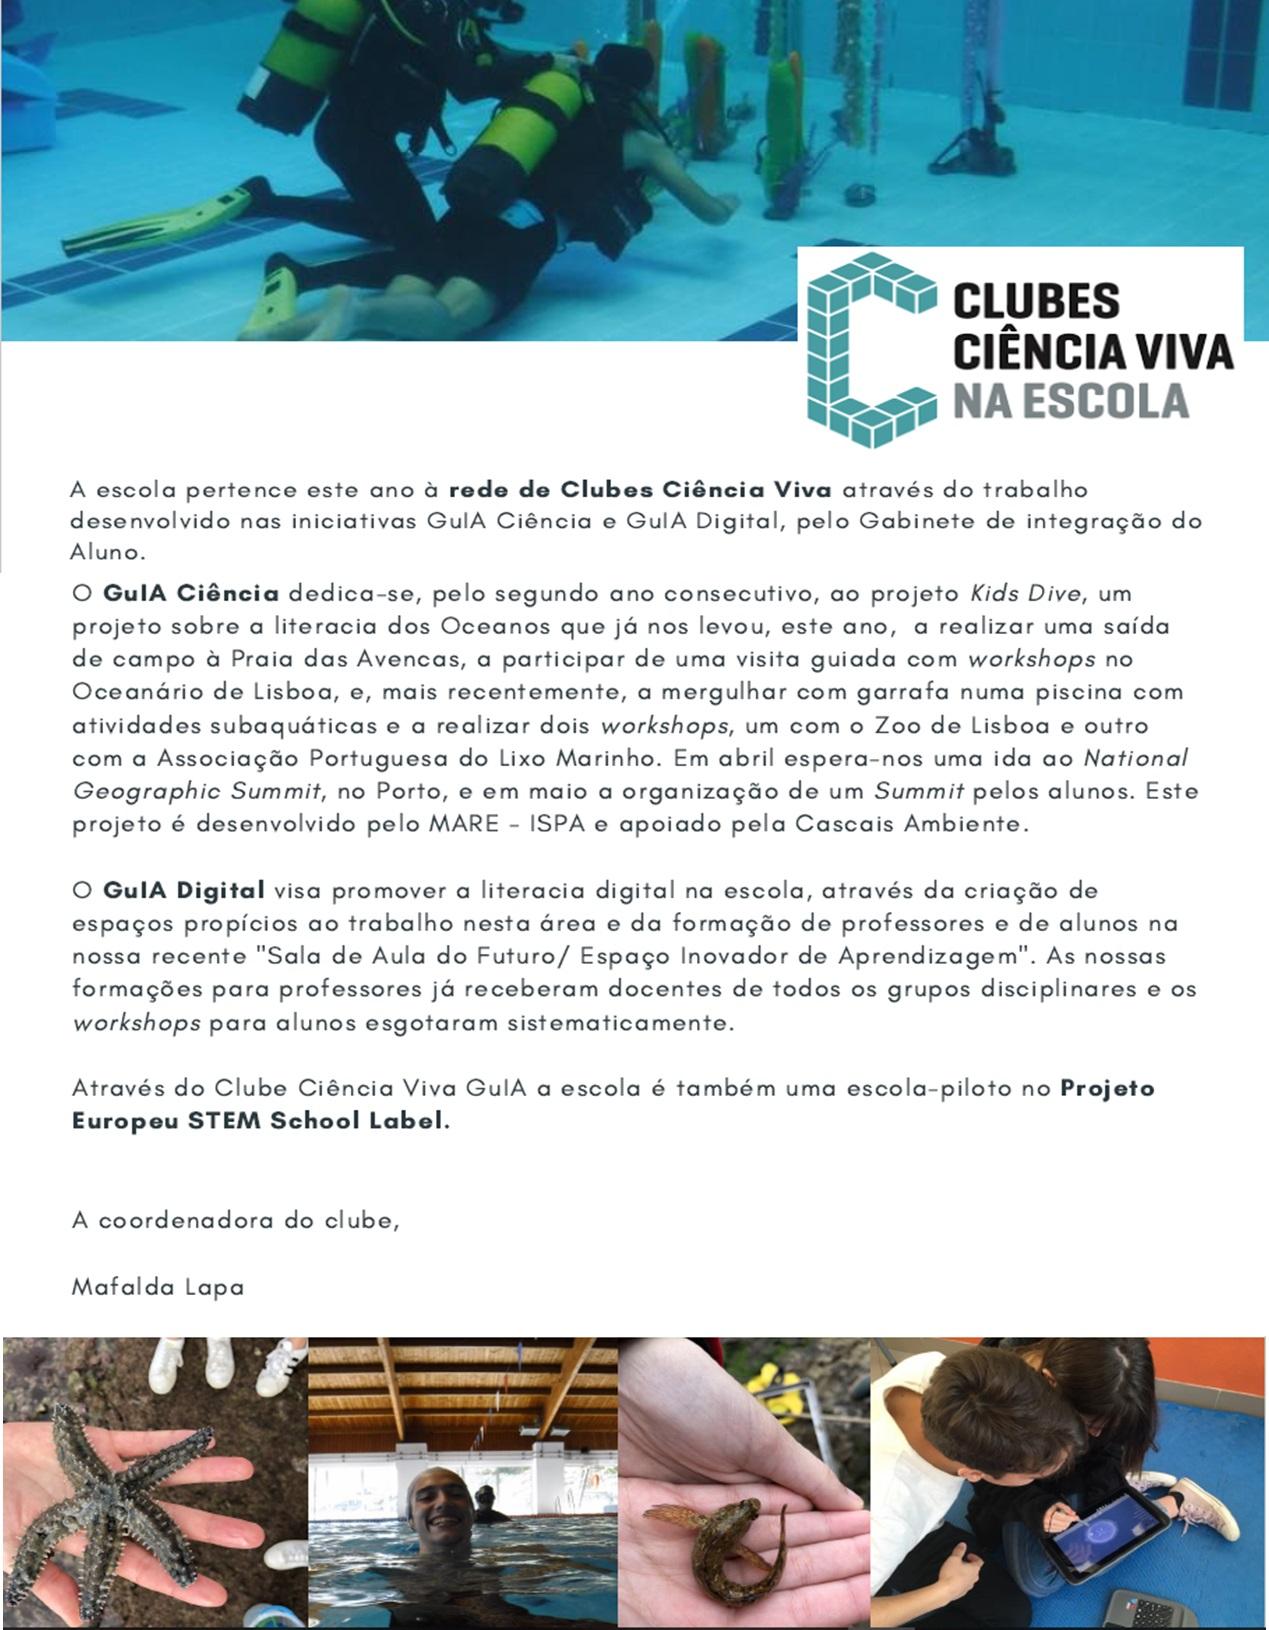 Clube Ciencia Viva GuIA